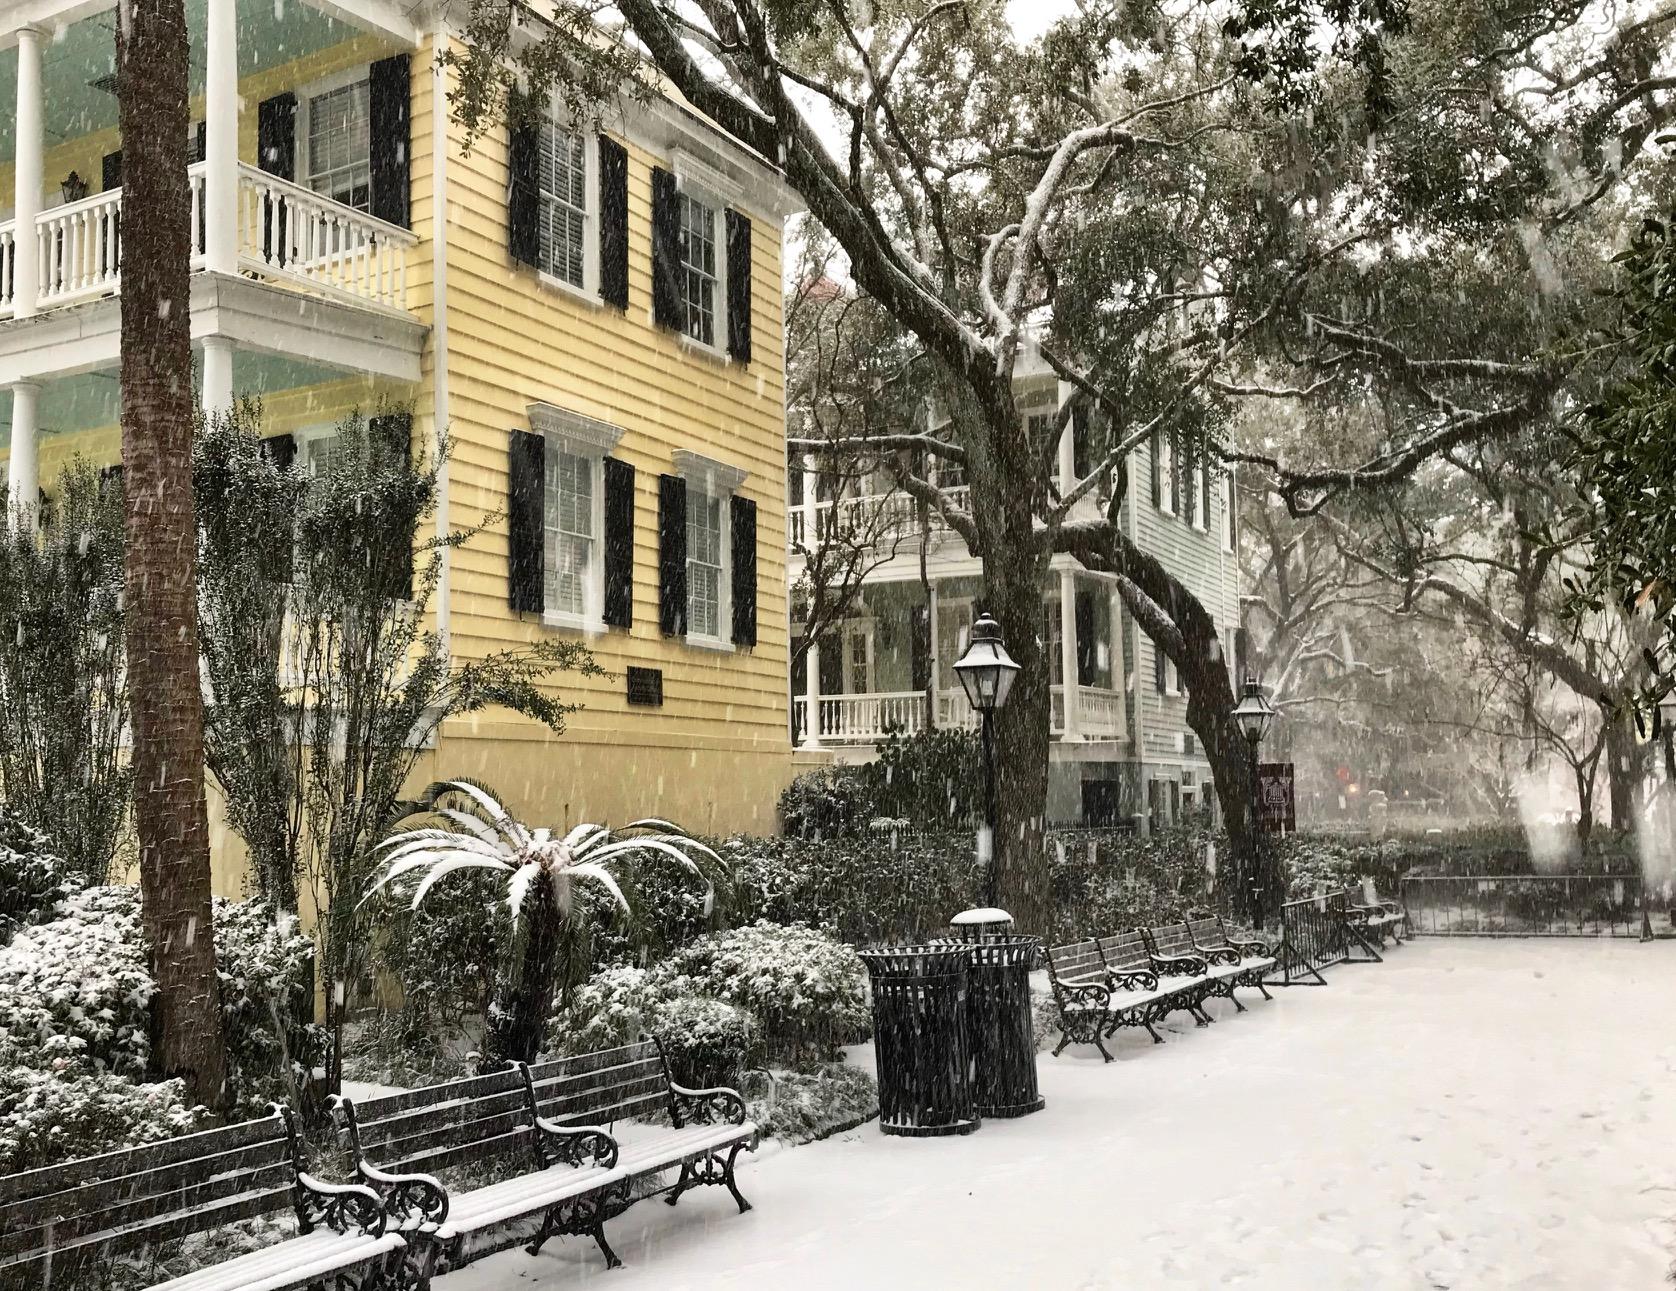 College of Charleston  by Steve Ramos